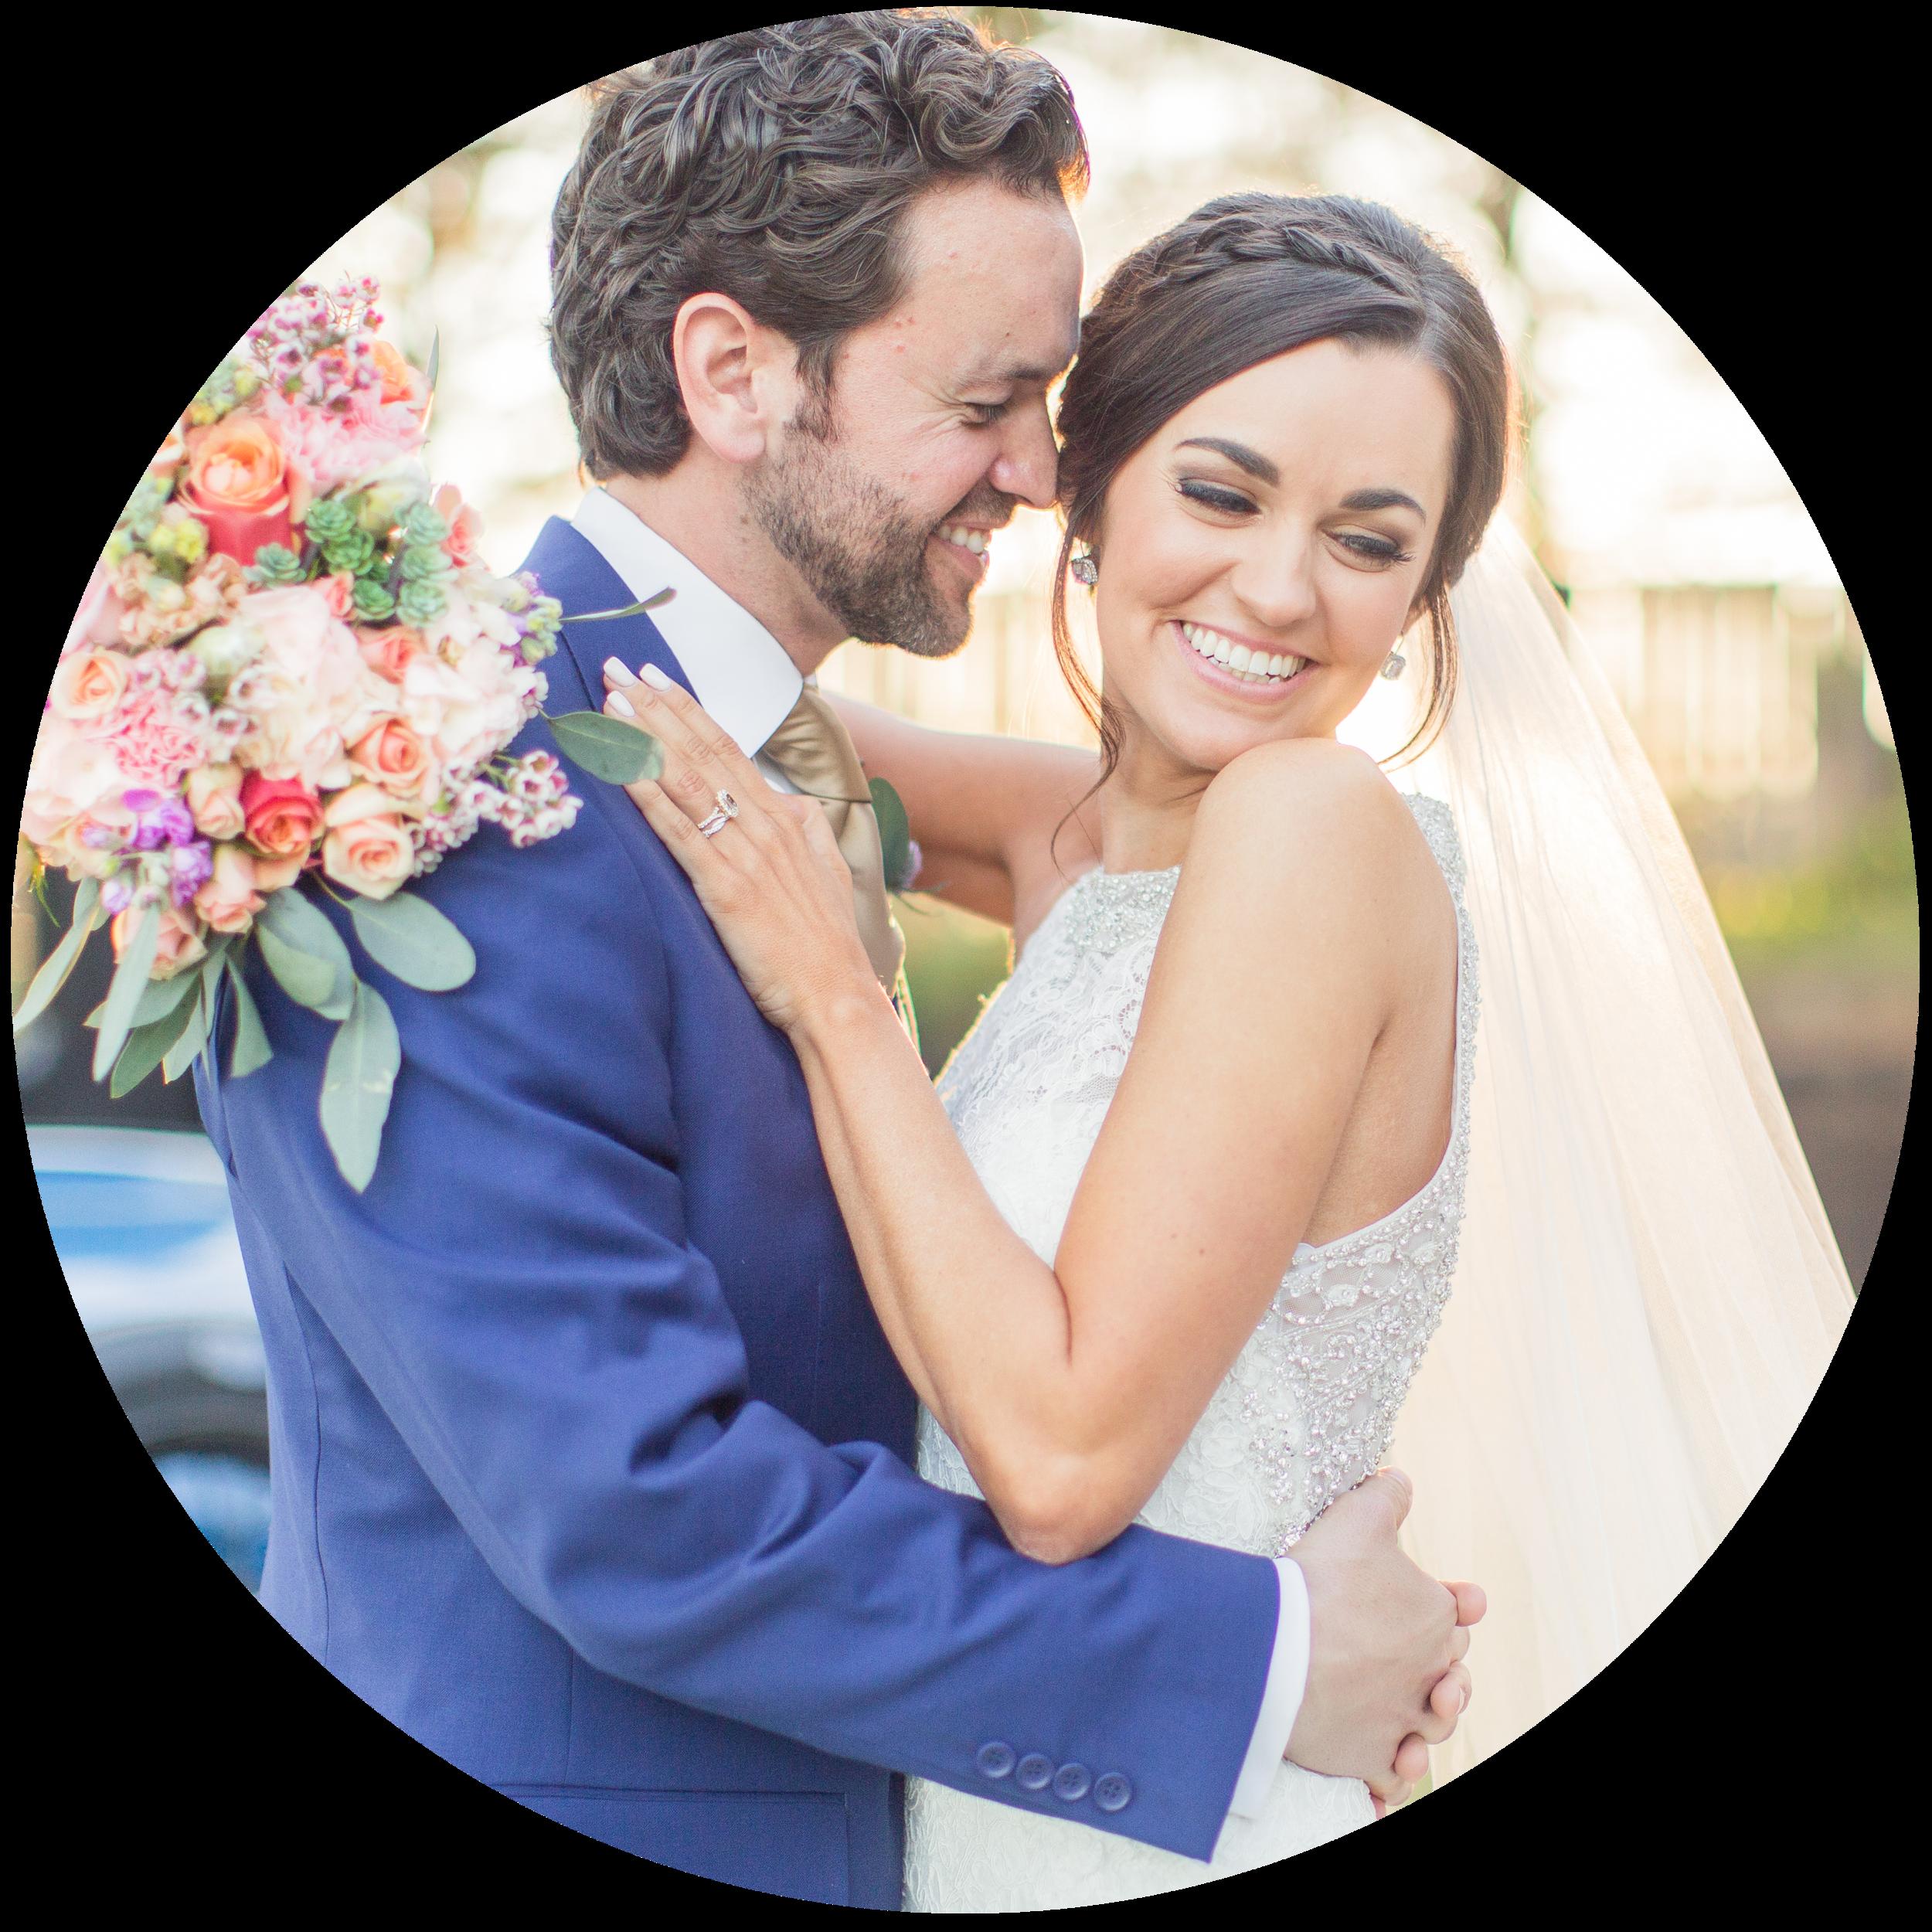 mississippi-wedding-photographer-3.png